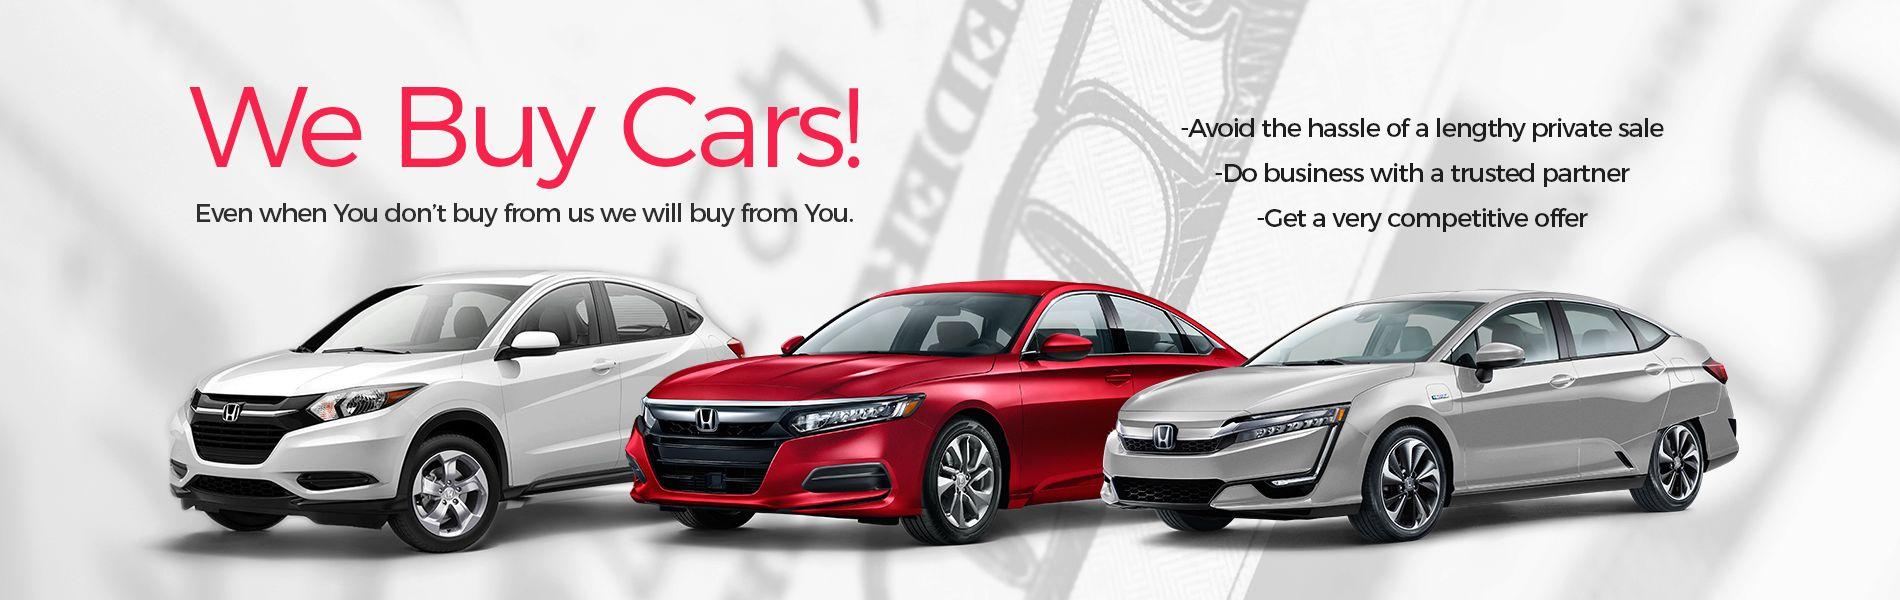 Honda Dealer Locator >> Metro Honda New Used Honda Dealer Serving San Bernadino County